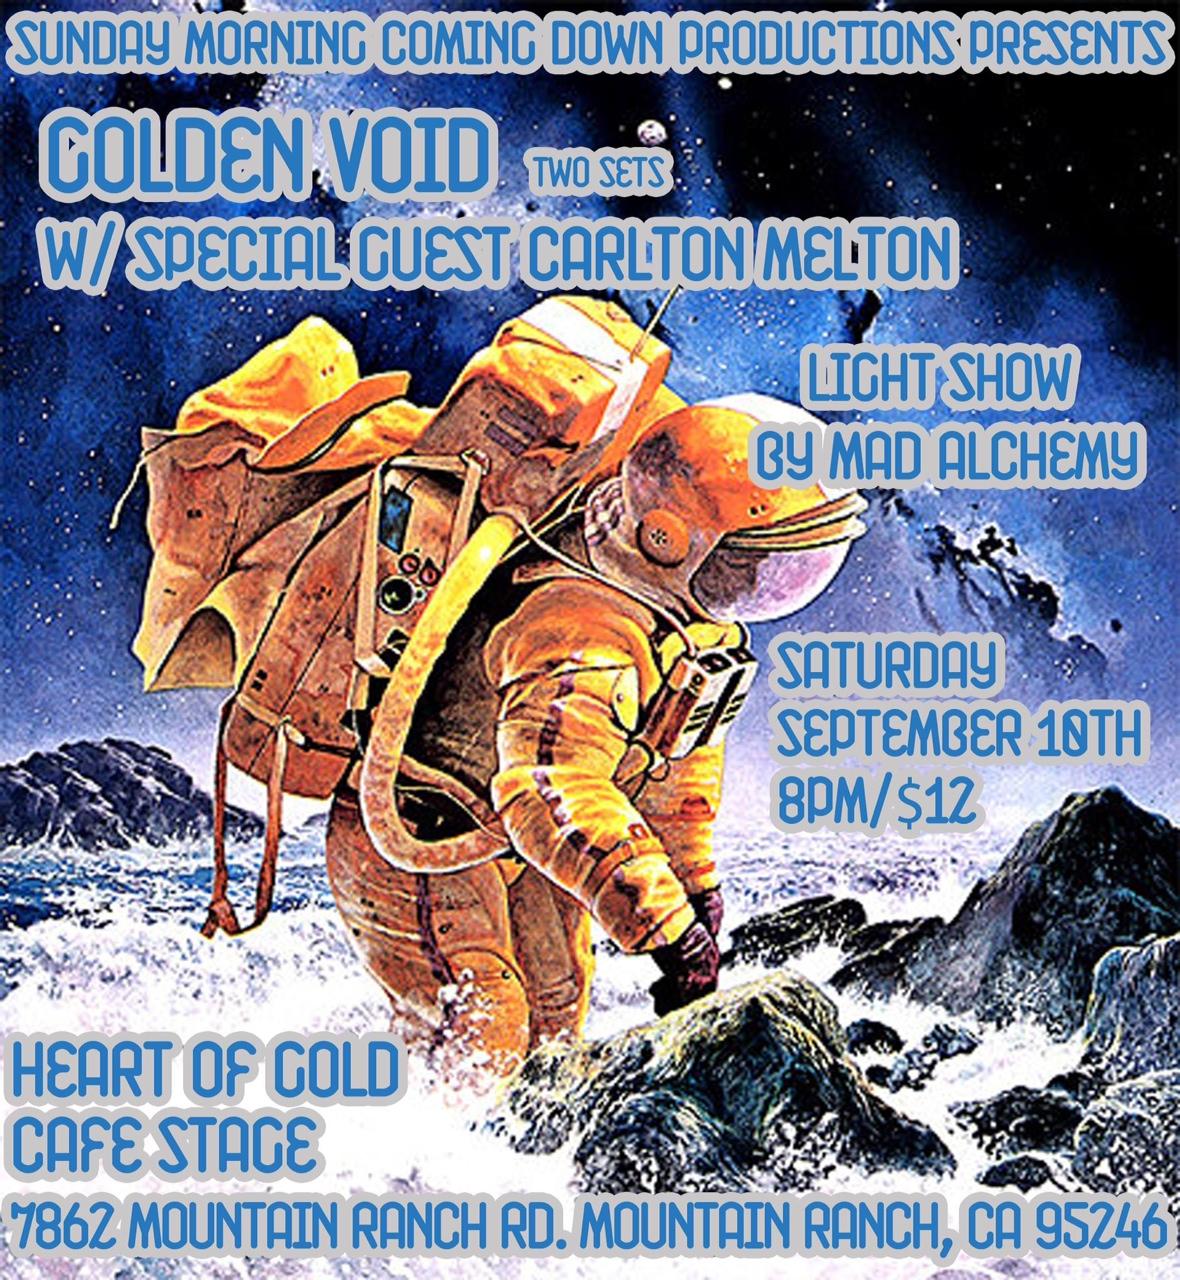 GoldenVoid-CM-HeartofGoldCafe.jpeg